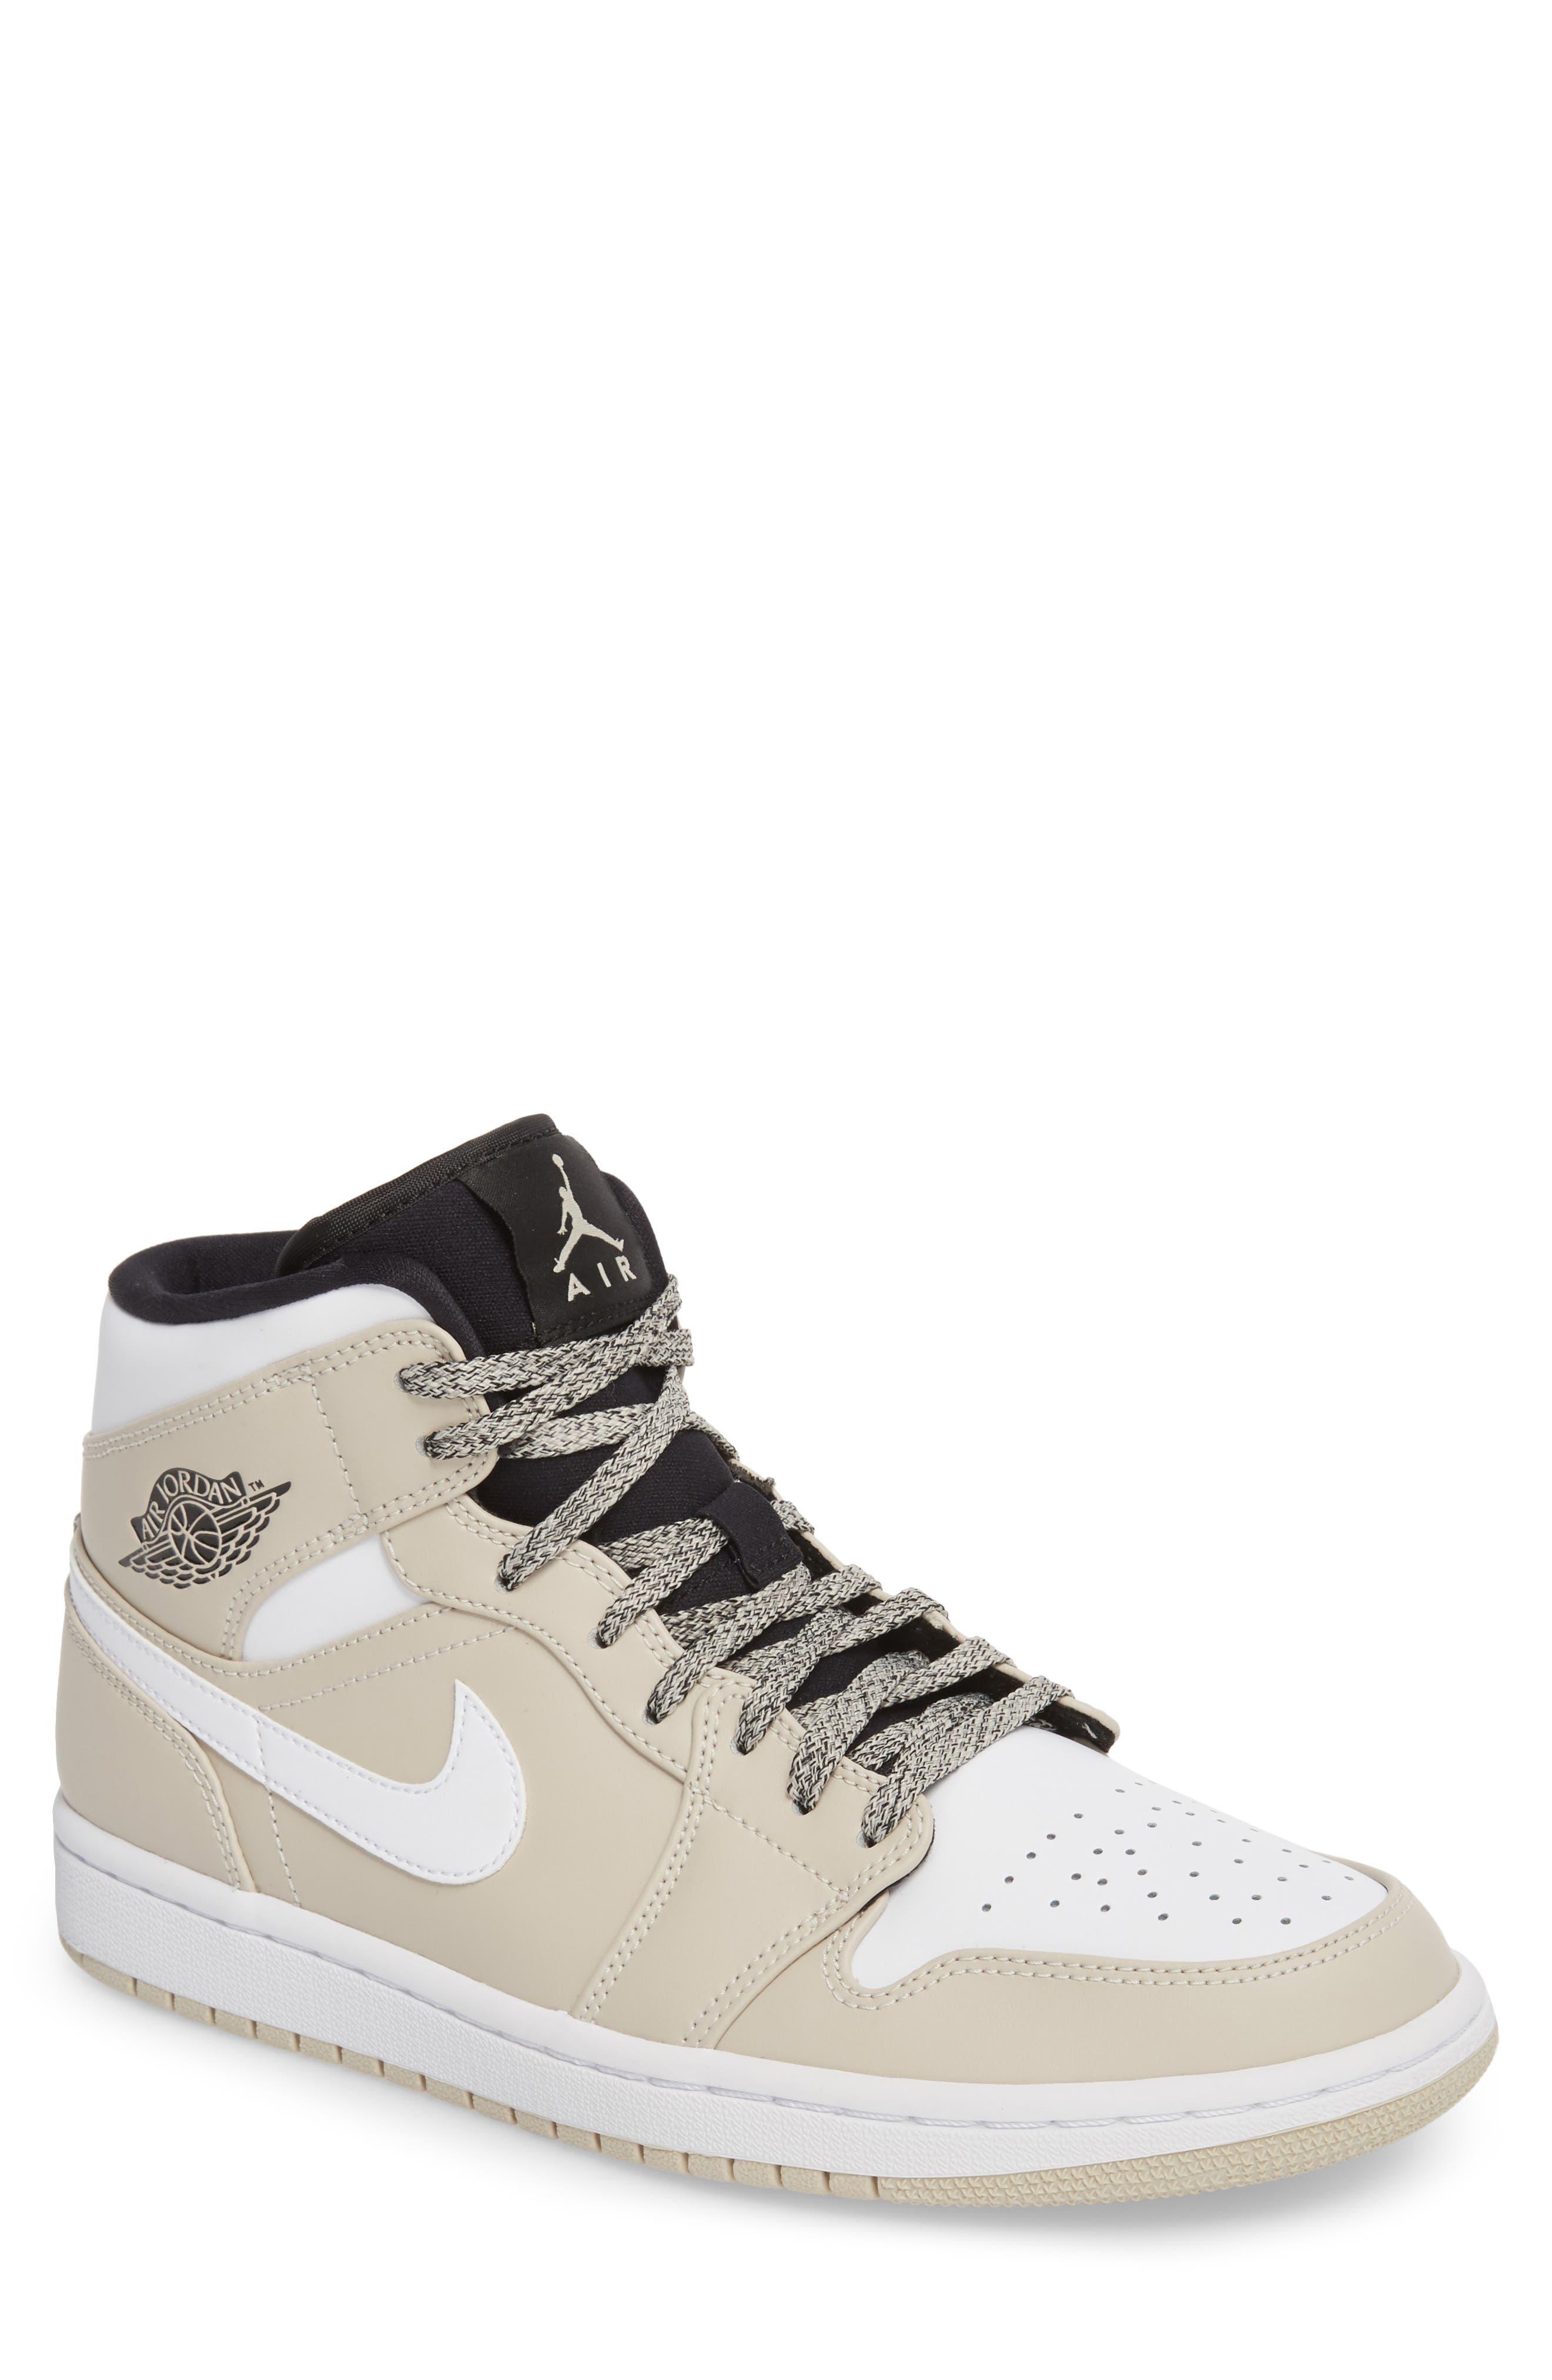 Nike 'Air Jordan 1 Mid' Sneaker ...